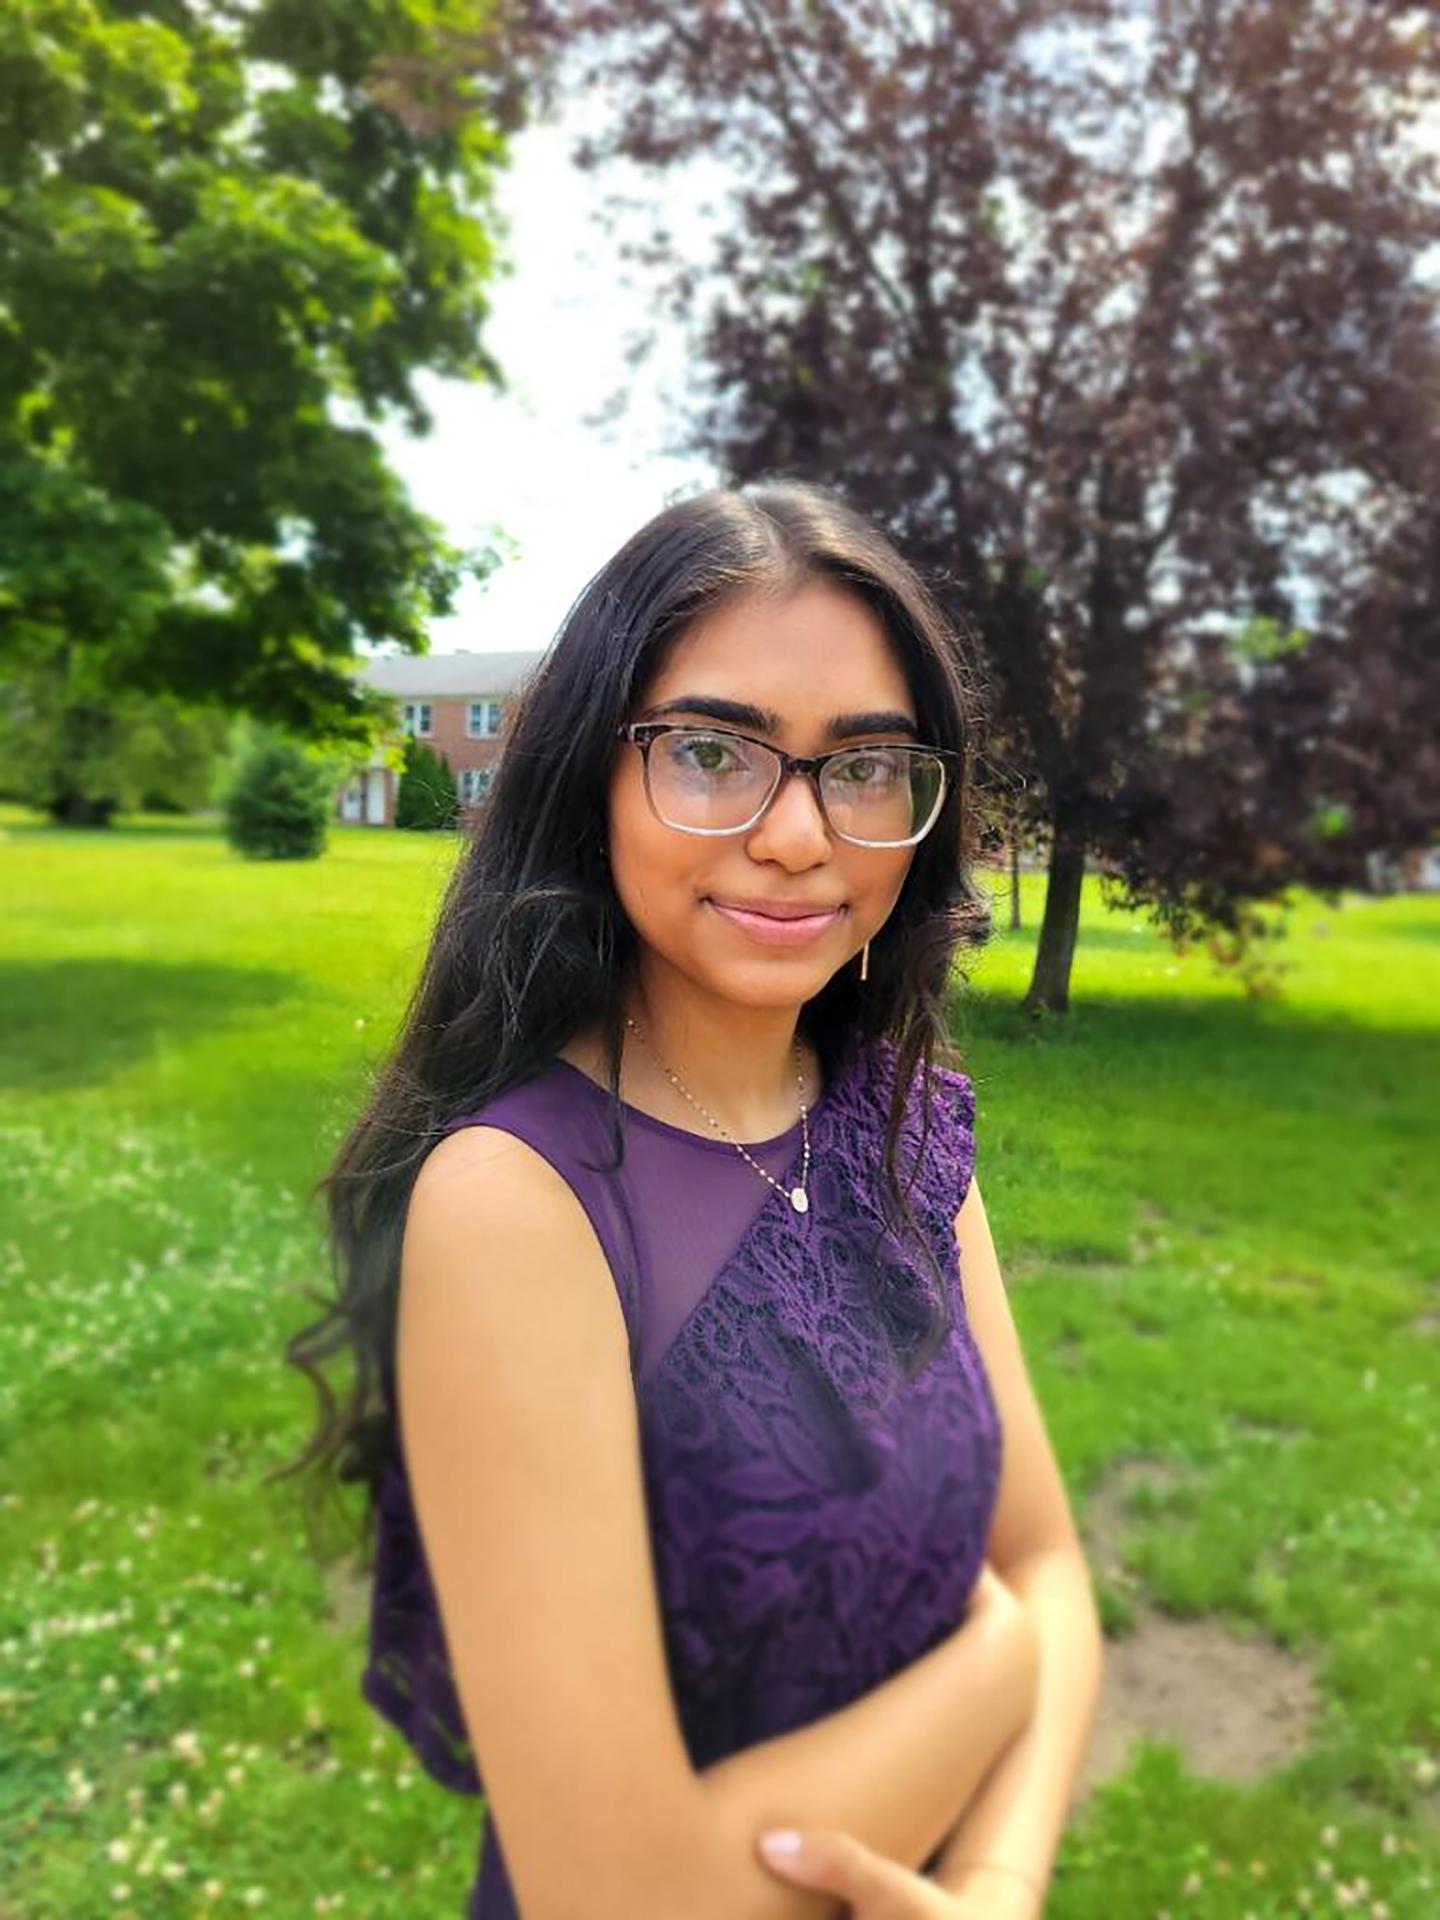 Shakshi Patel, Self-portrait, 2021